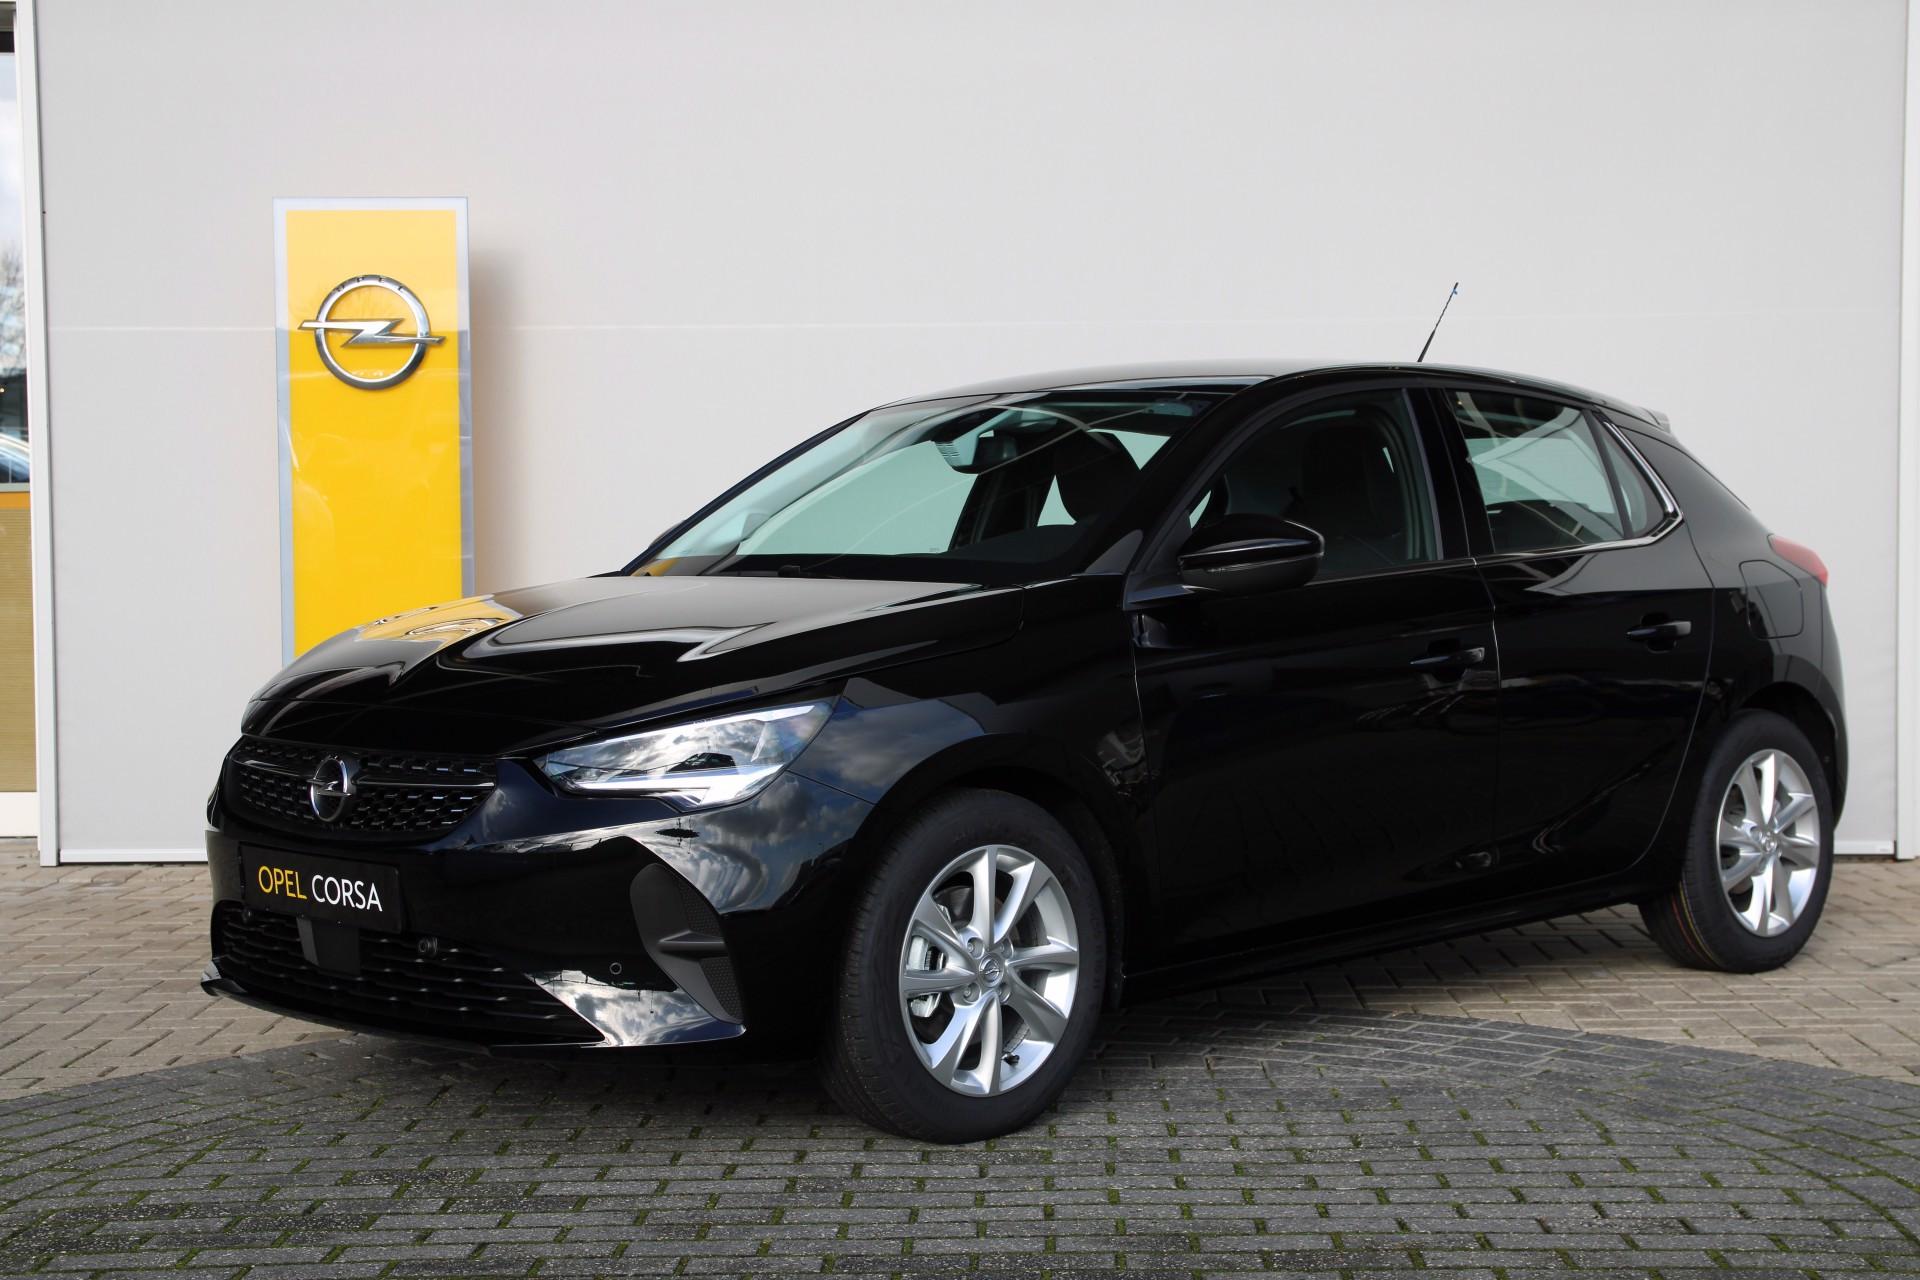 Opel Corsa 1.2 100 Pk Elegance 2021 nieuw kopen   Auto.nl